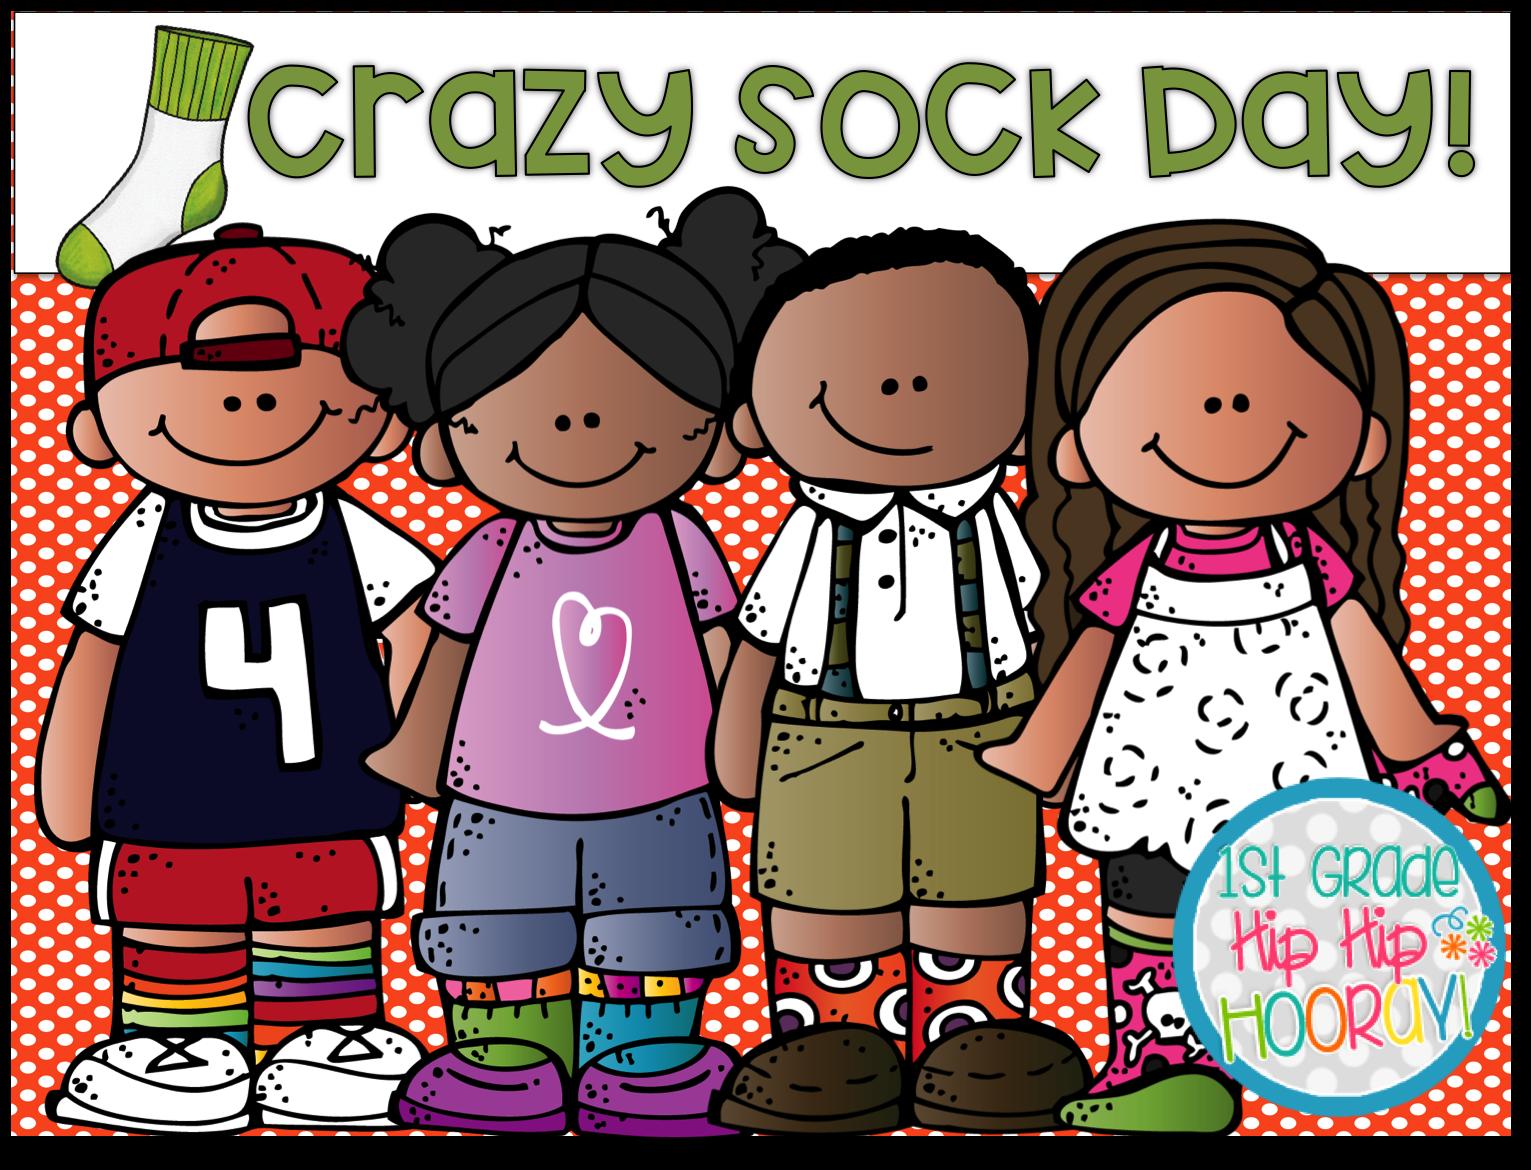 1st Grade Hip Hip Hooray!: Crazy Sock Day!.